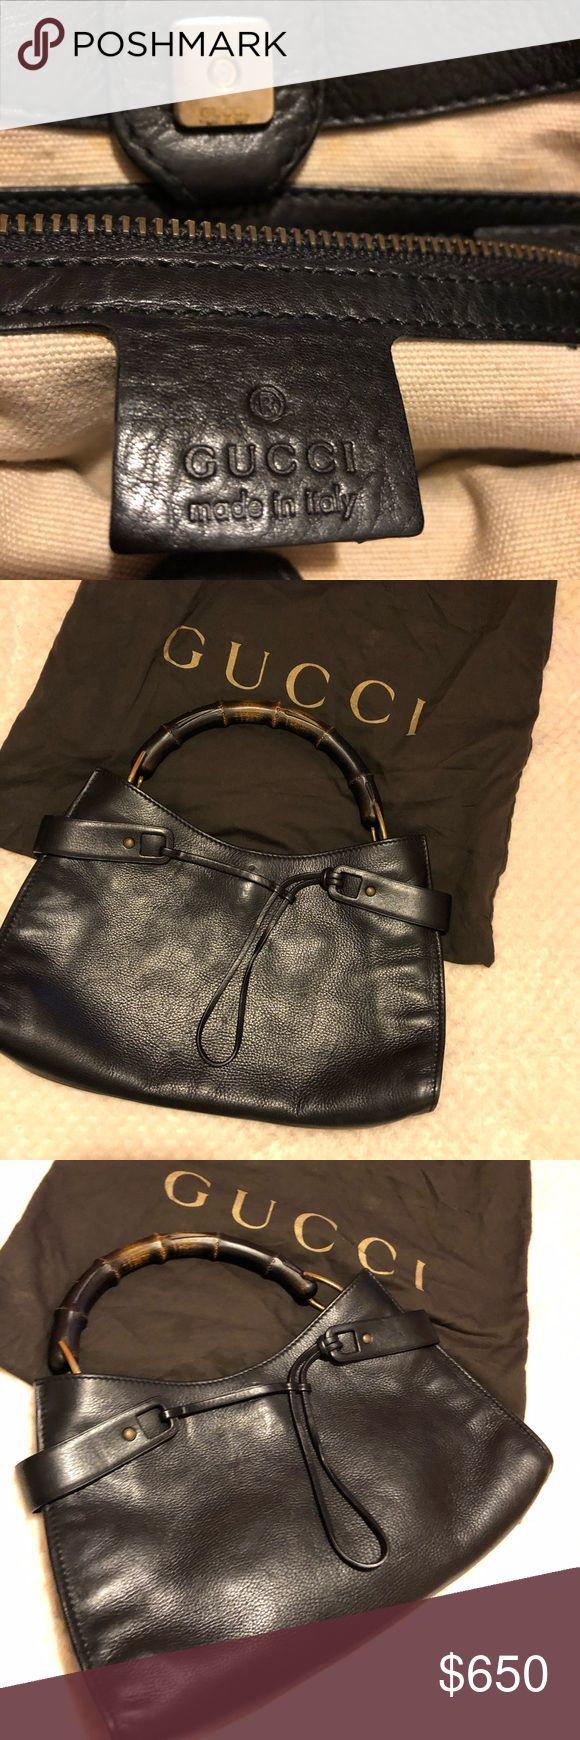 Black Gucci bag Black leather Gucci bamboo bag Gucci Bags Shoulder Bags  Black Gucci bag Black leather Gucci bamboo bag Gucci Bags Shoulder Bags